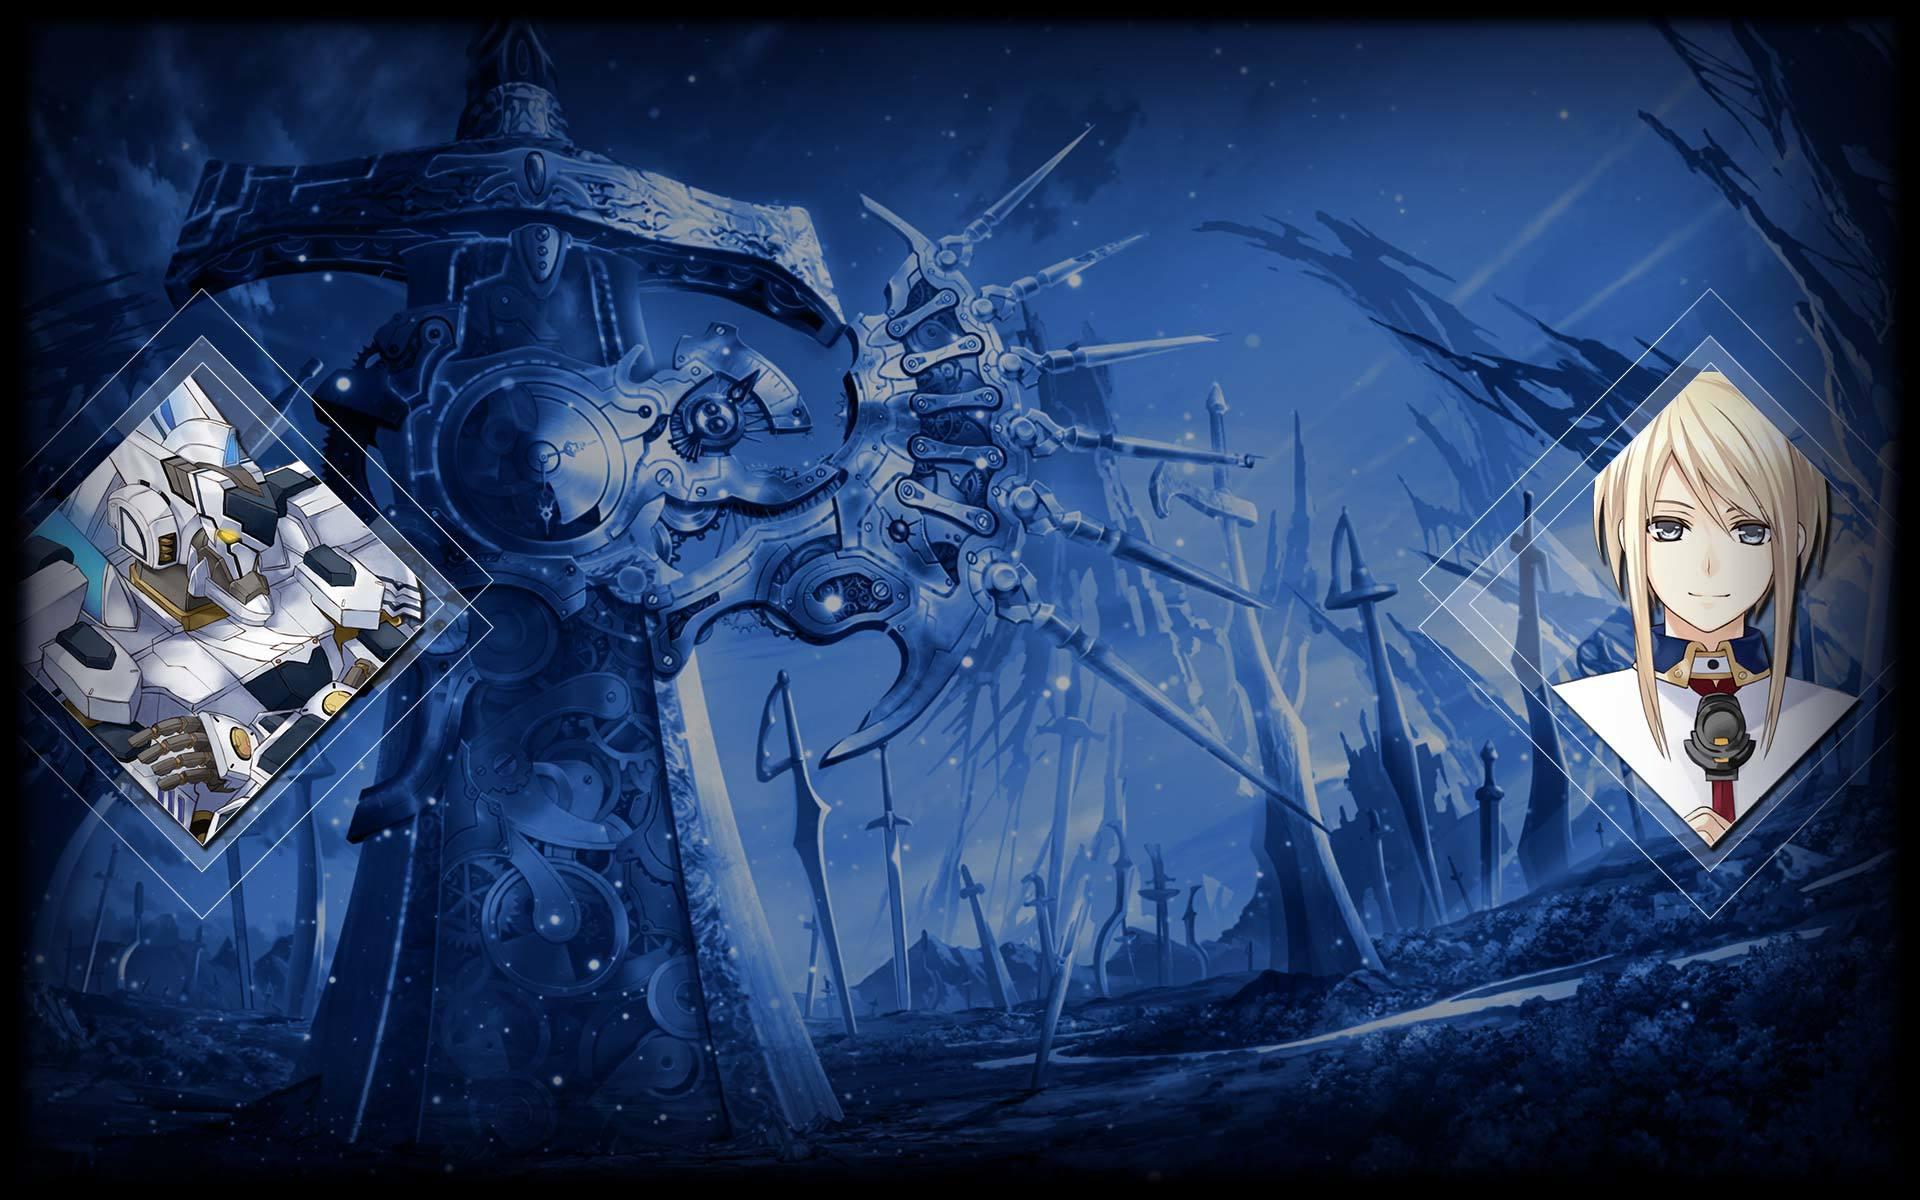 Fairy Fencer F: Advent Dark Force Wallpaper 006 - Sherman and Ryushin